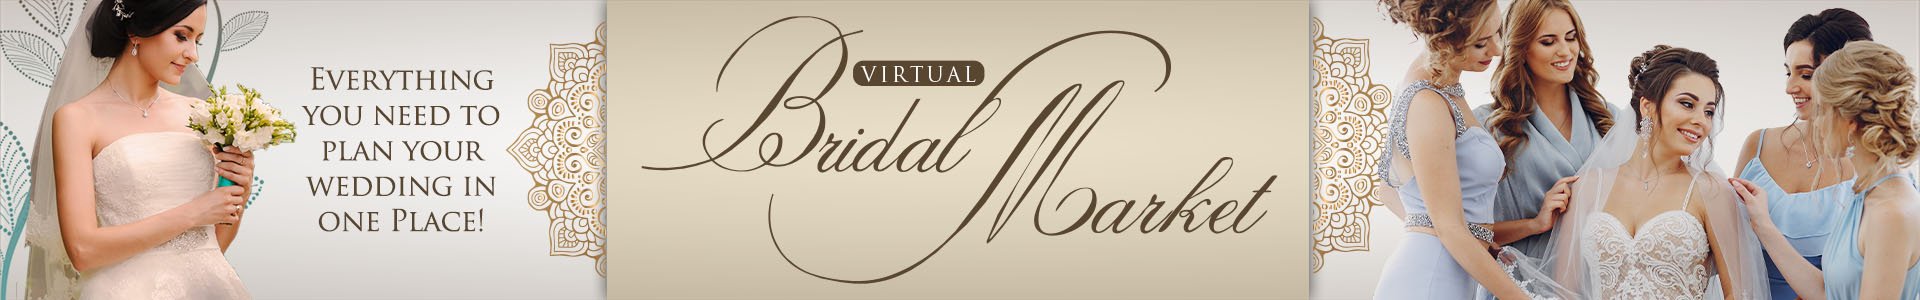 Virtual Bridal Market